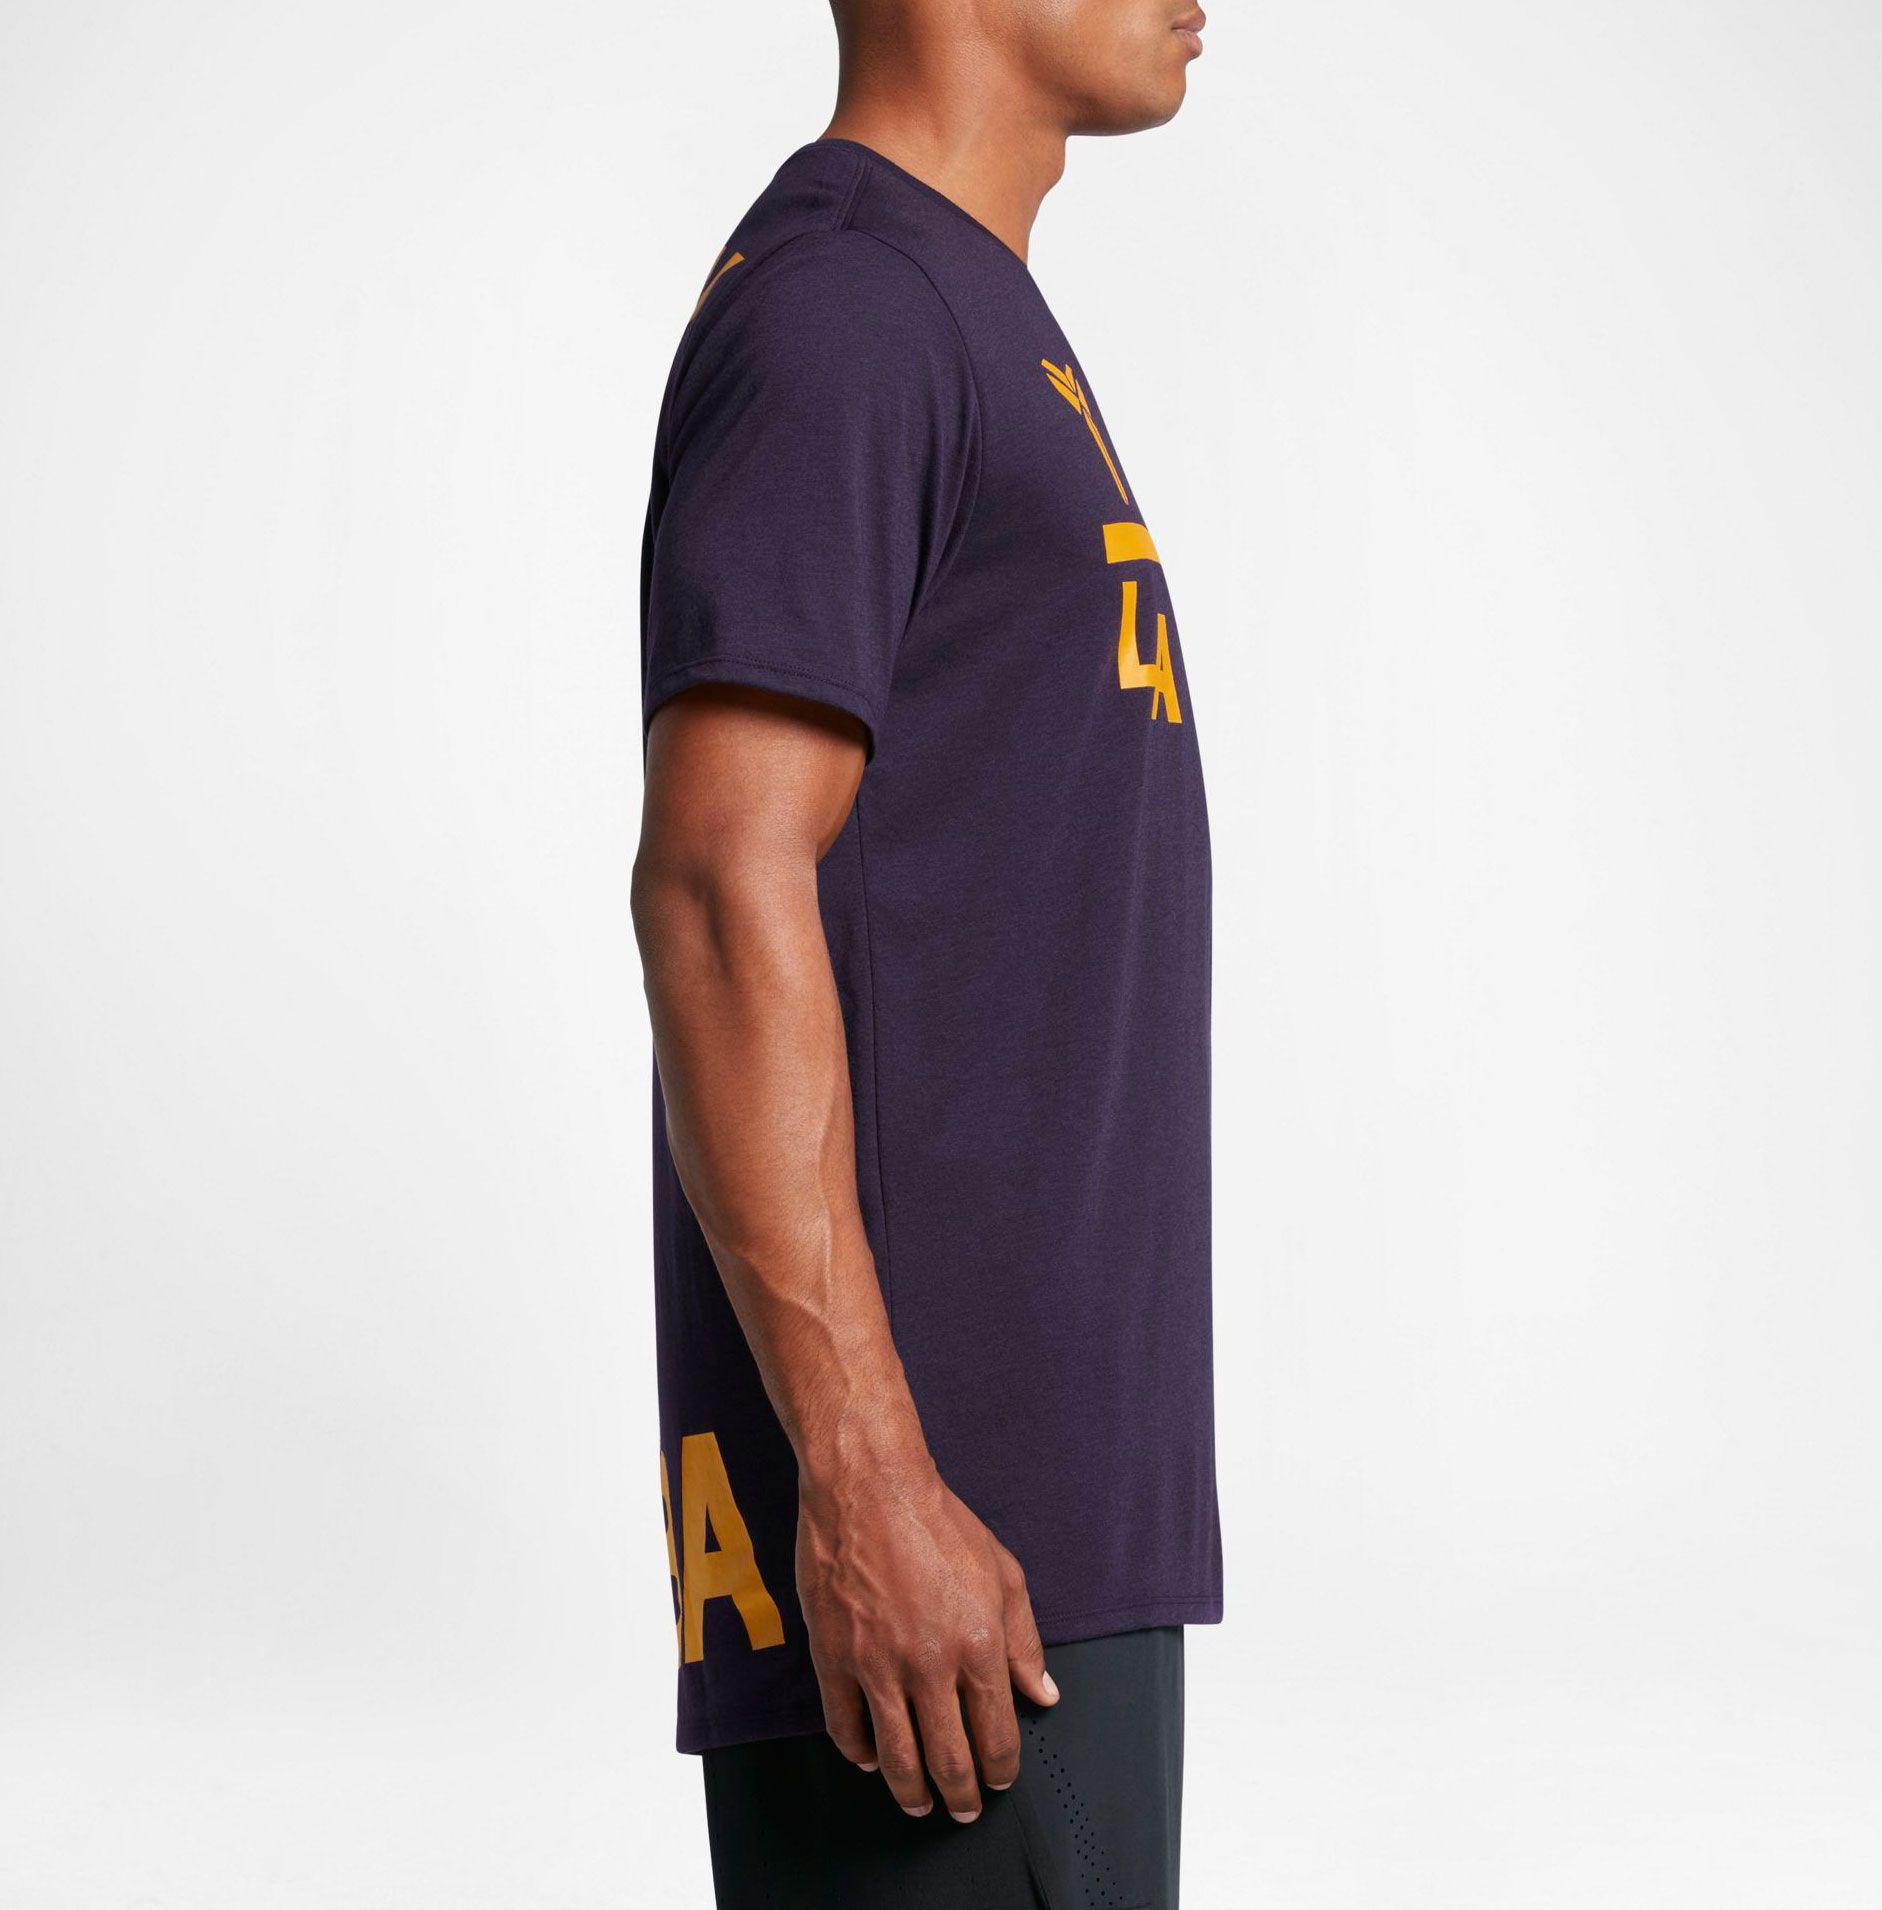 Kobe Art Droptail Graphic Basketball T shirt